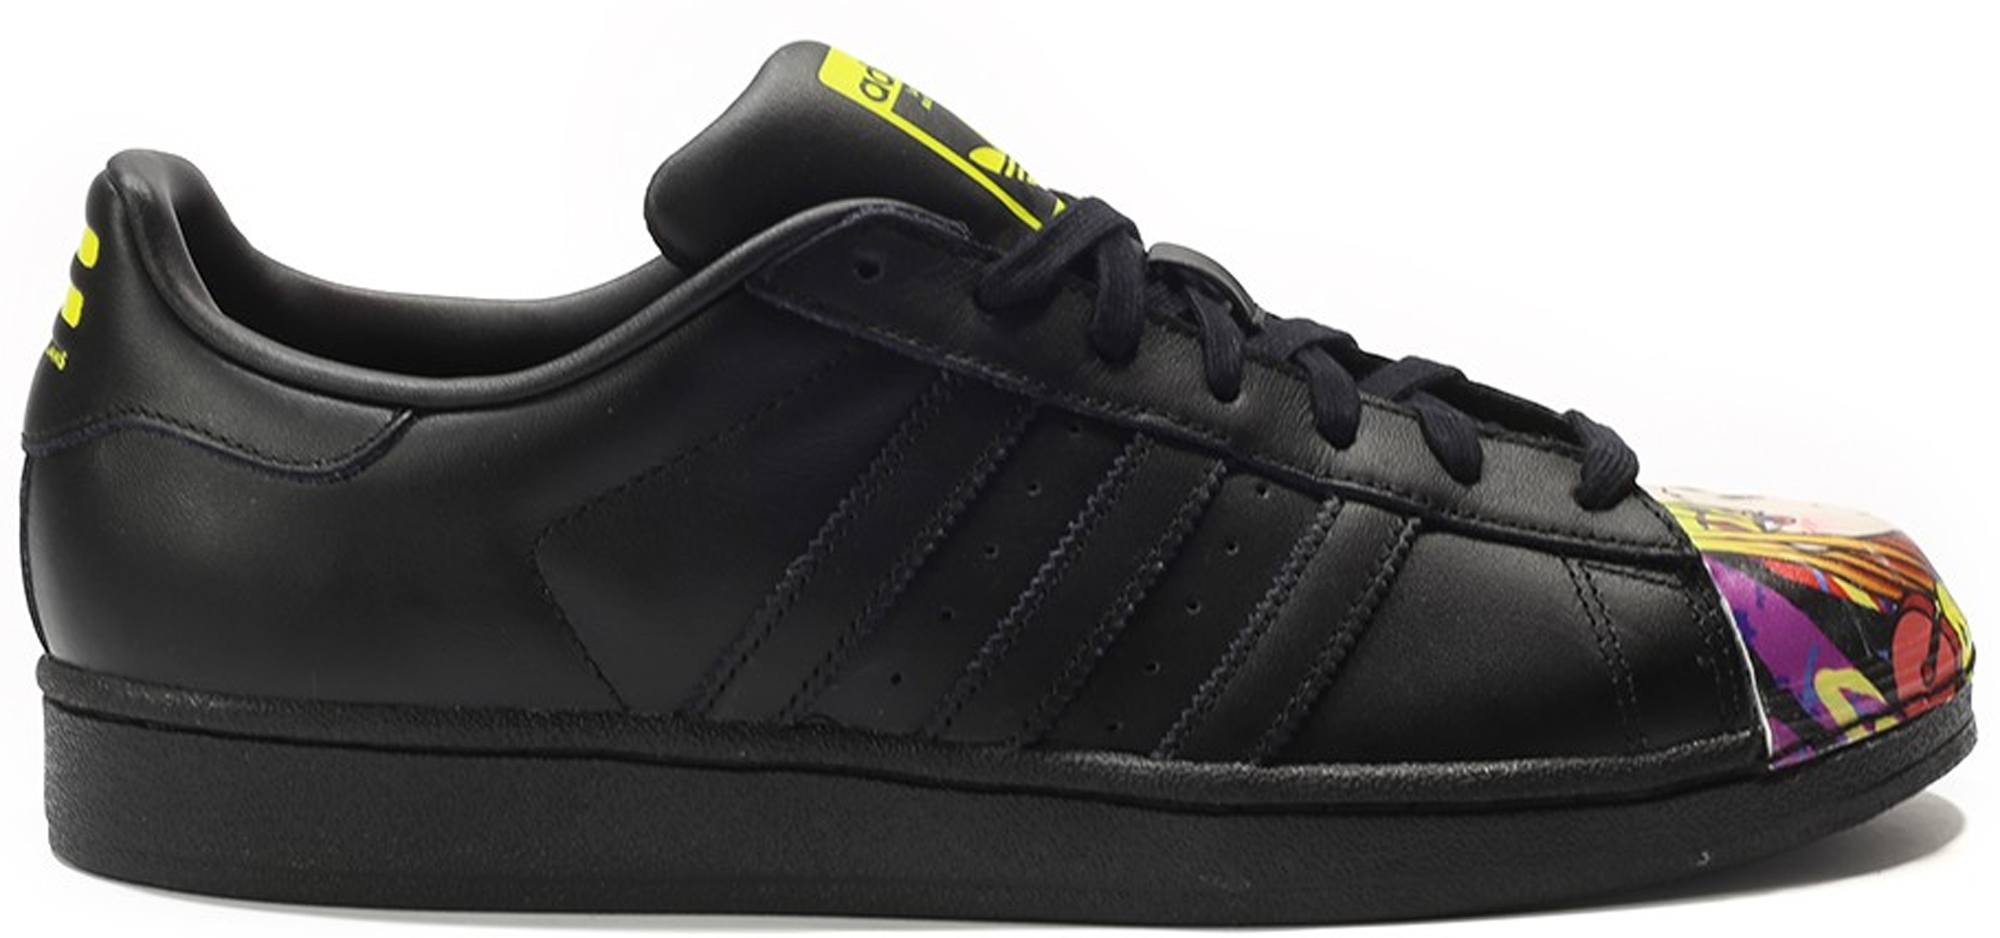 adidas superstar black and yellow